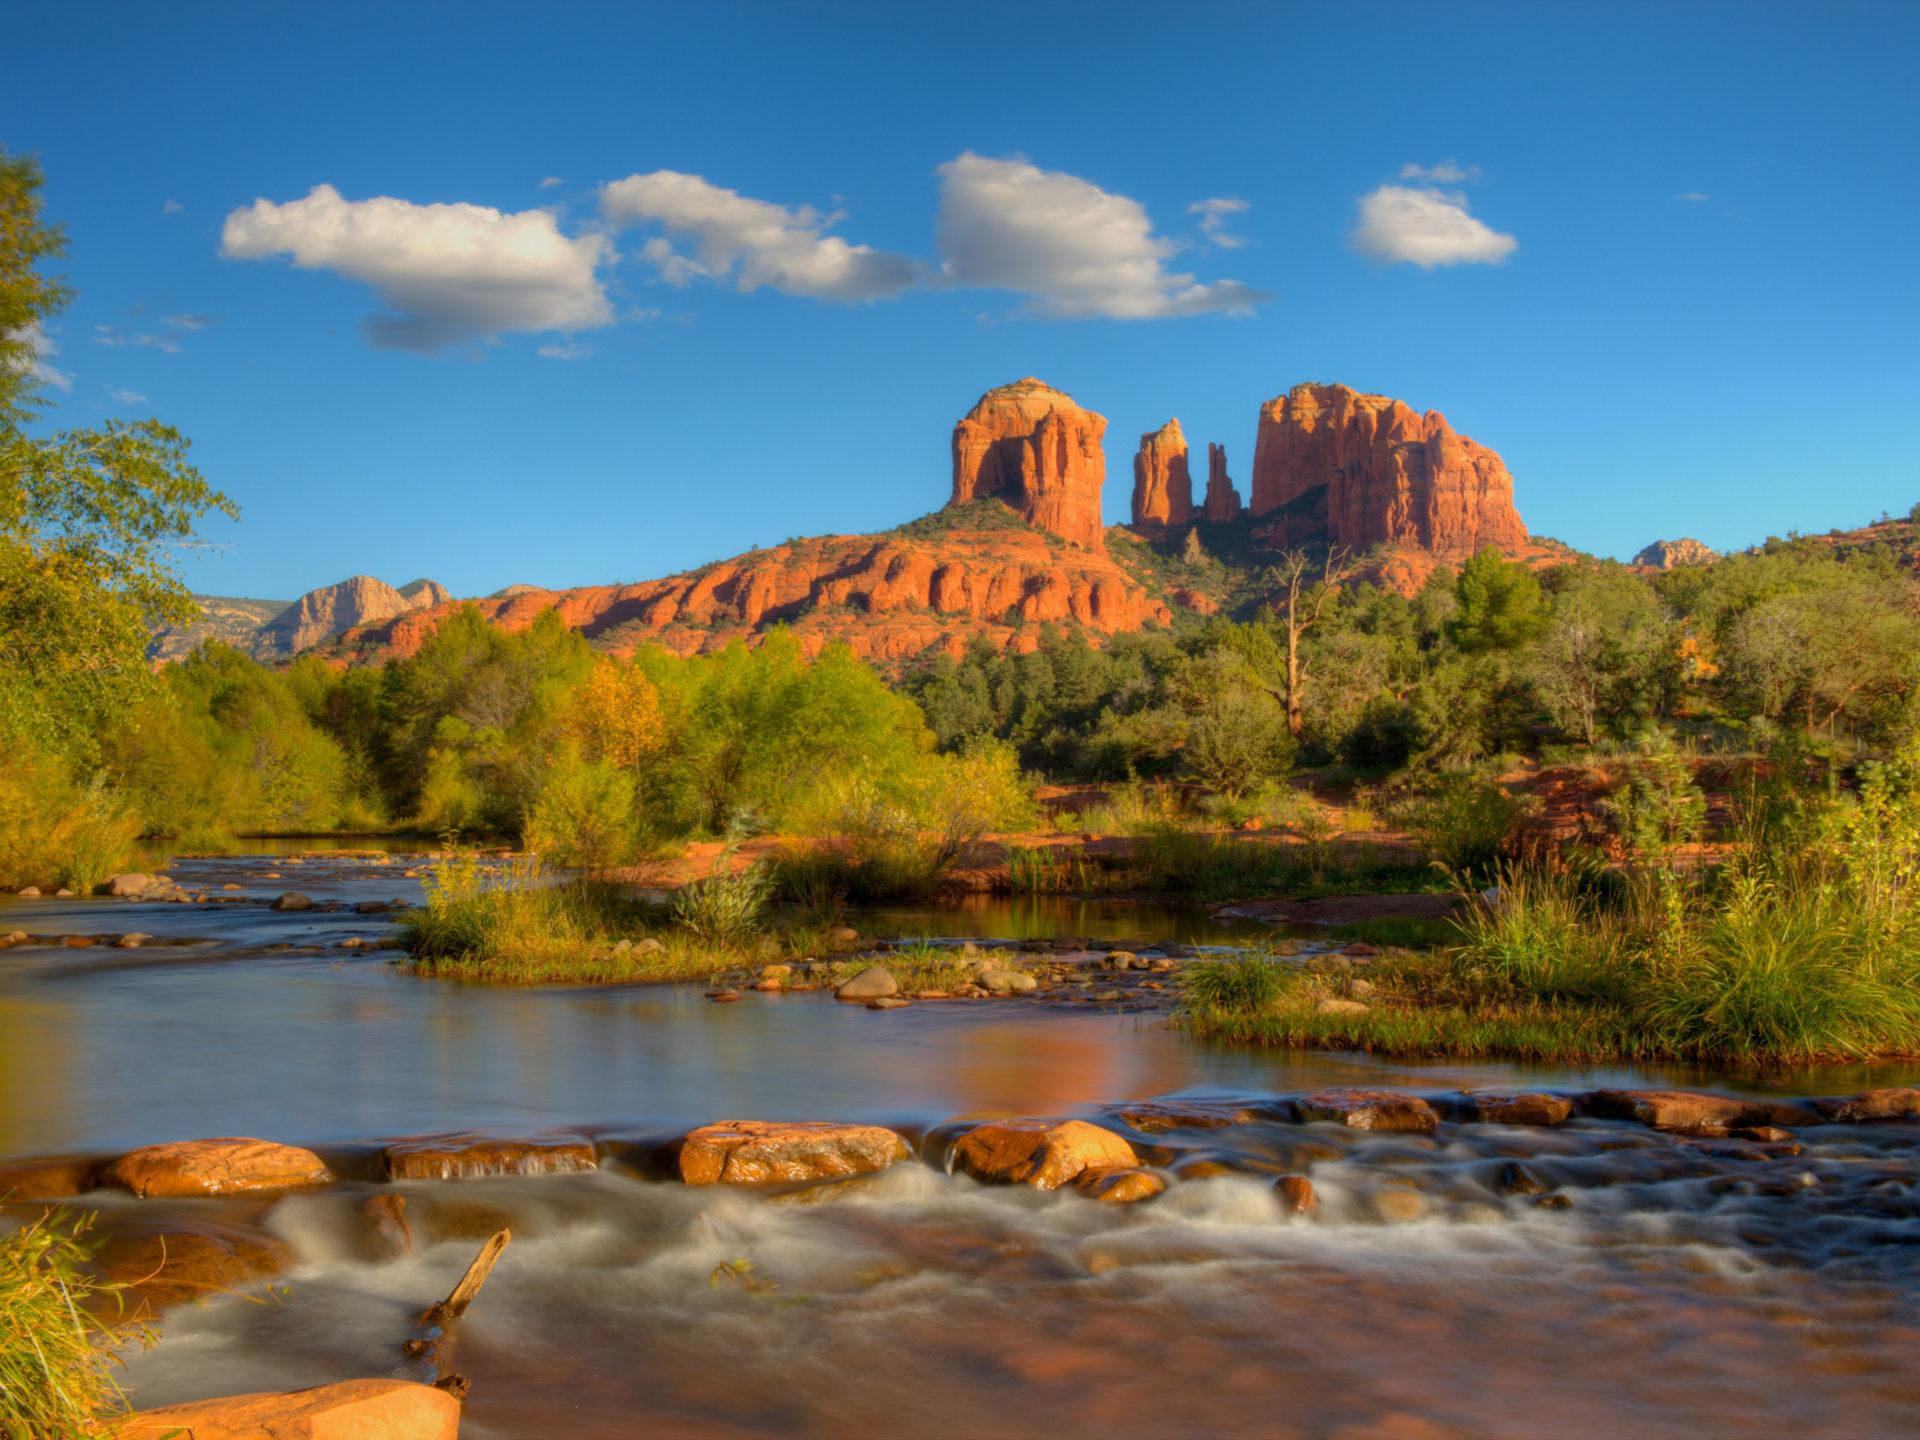 Fall Season Wallpapers Hd Oak Creek And Cathedral Rock Sedona Arizona Usa Hd